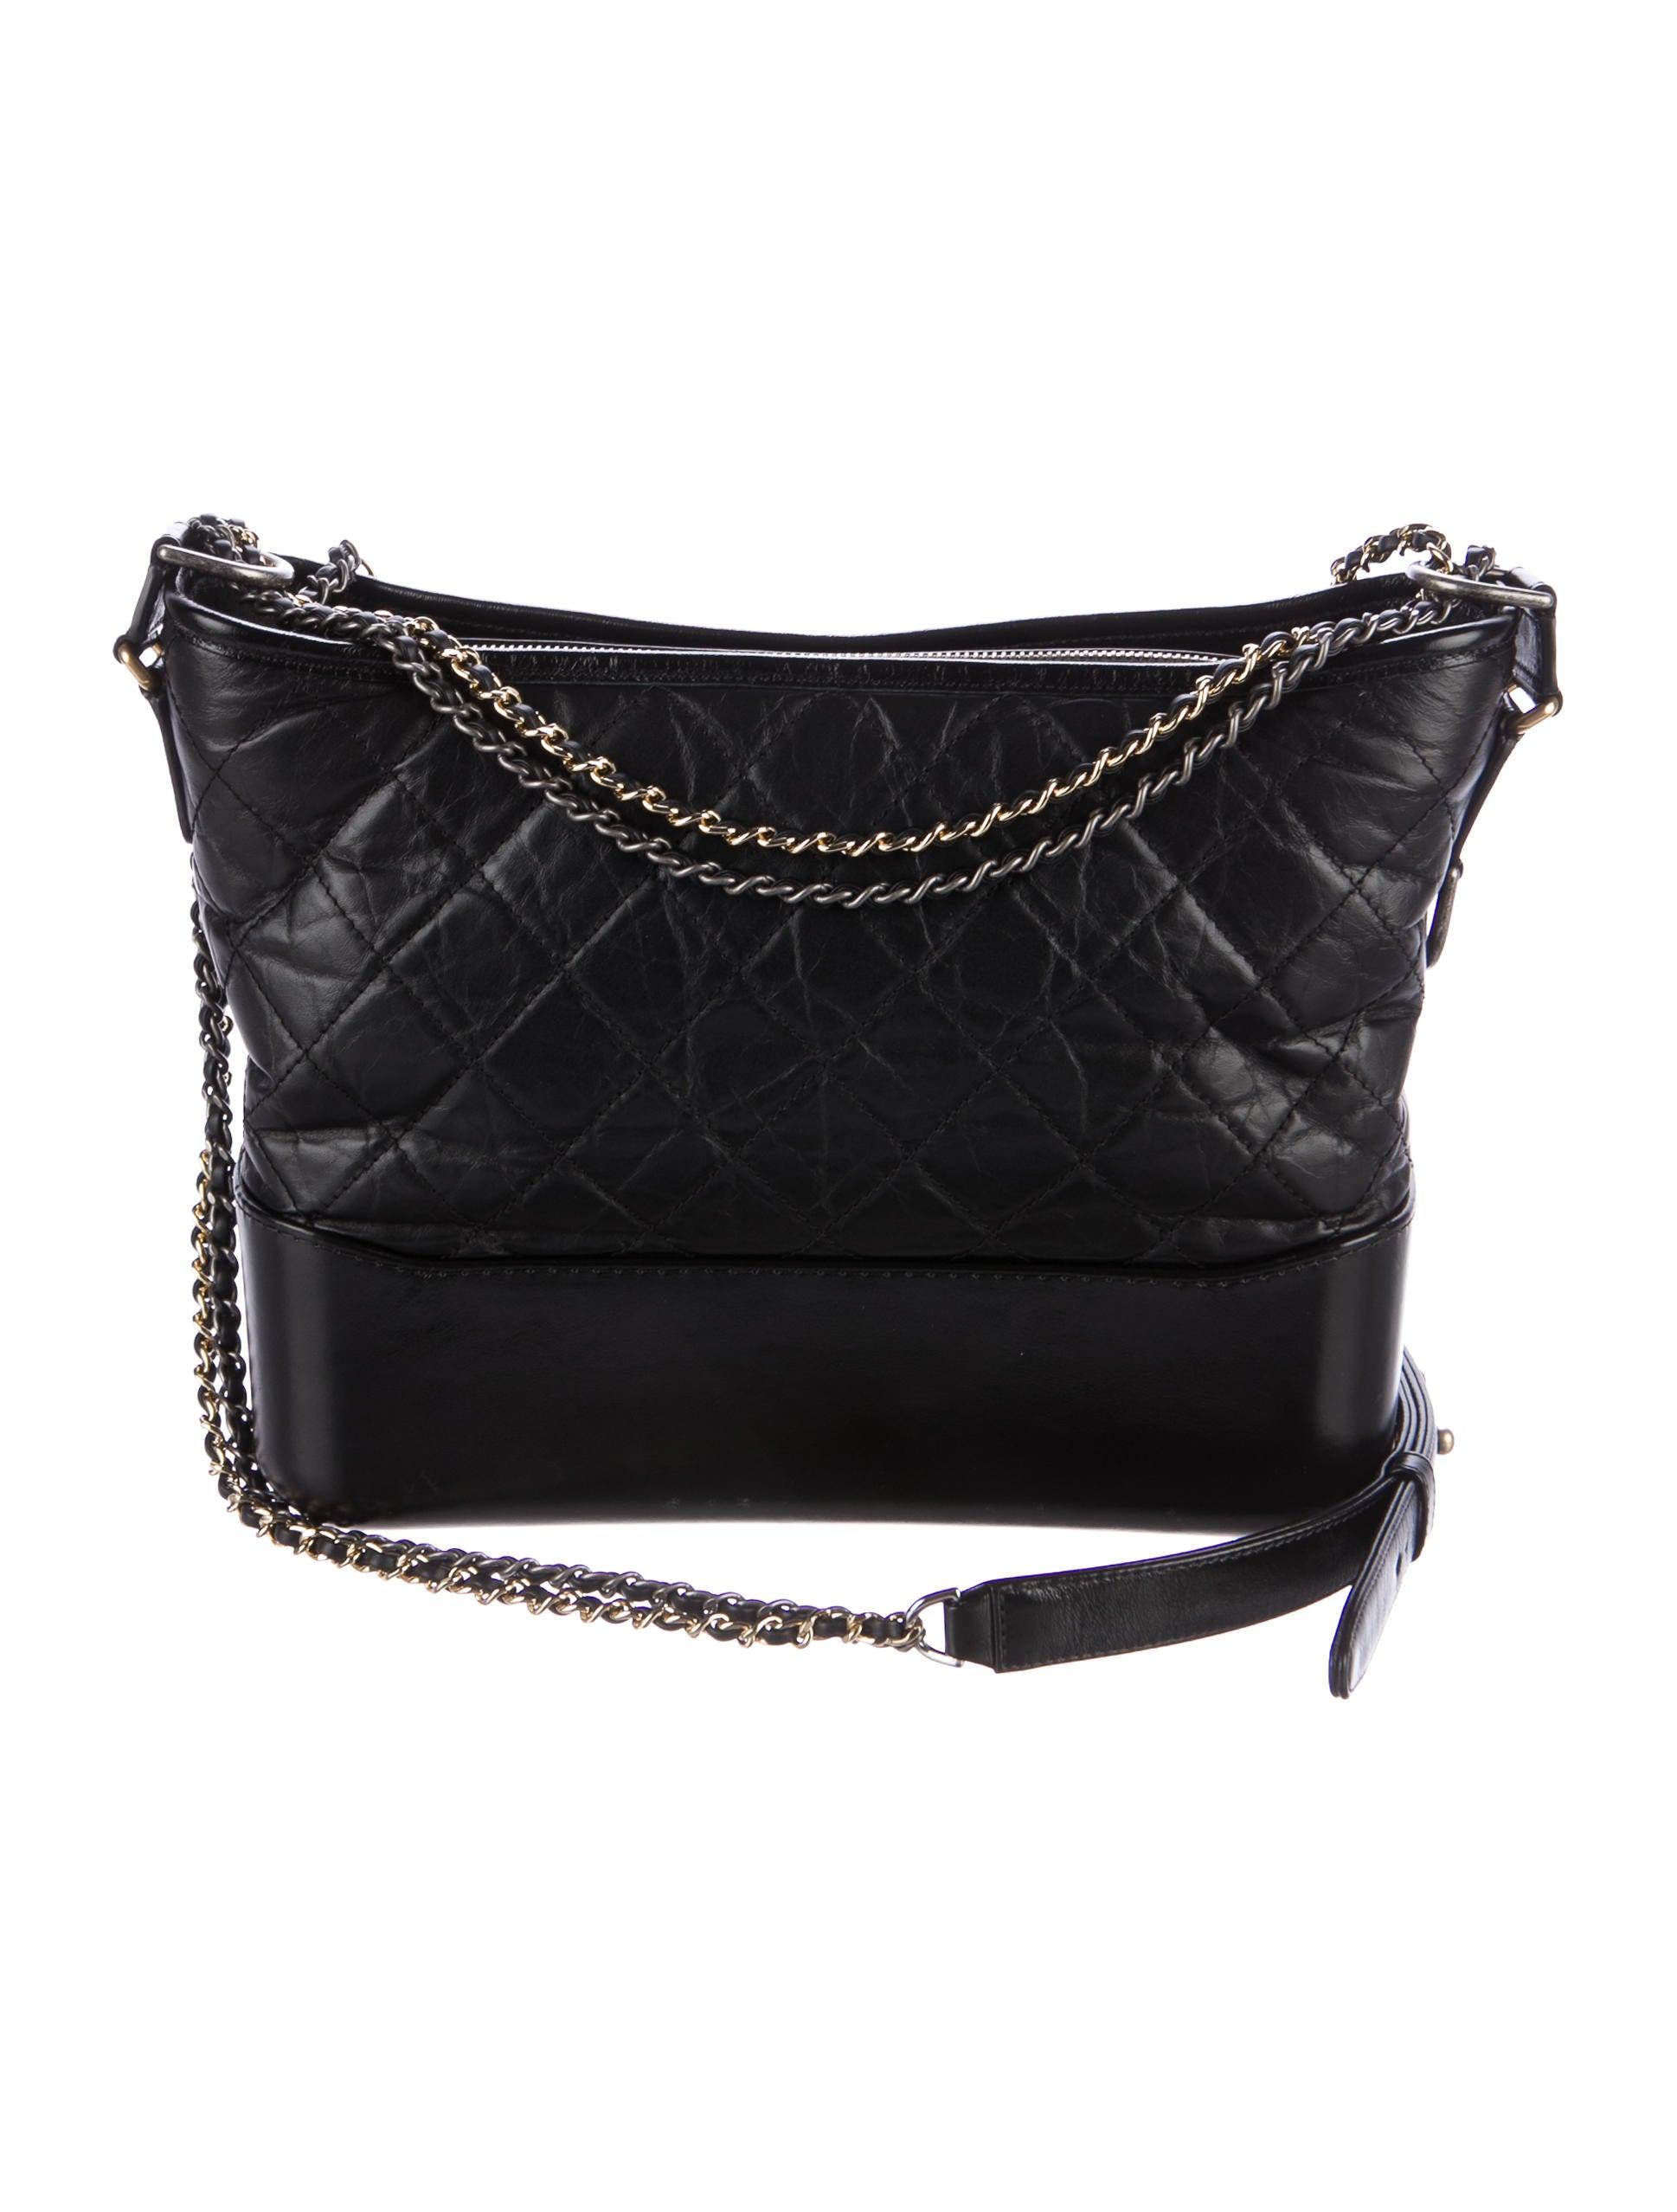 ad41a3f36b1c0e Chanel 2017 Medium Gabrielle Bag - Handbags - CHA216356 | The RealReal